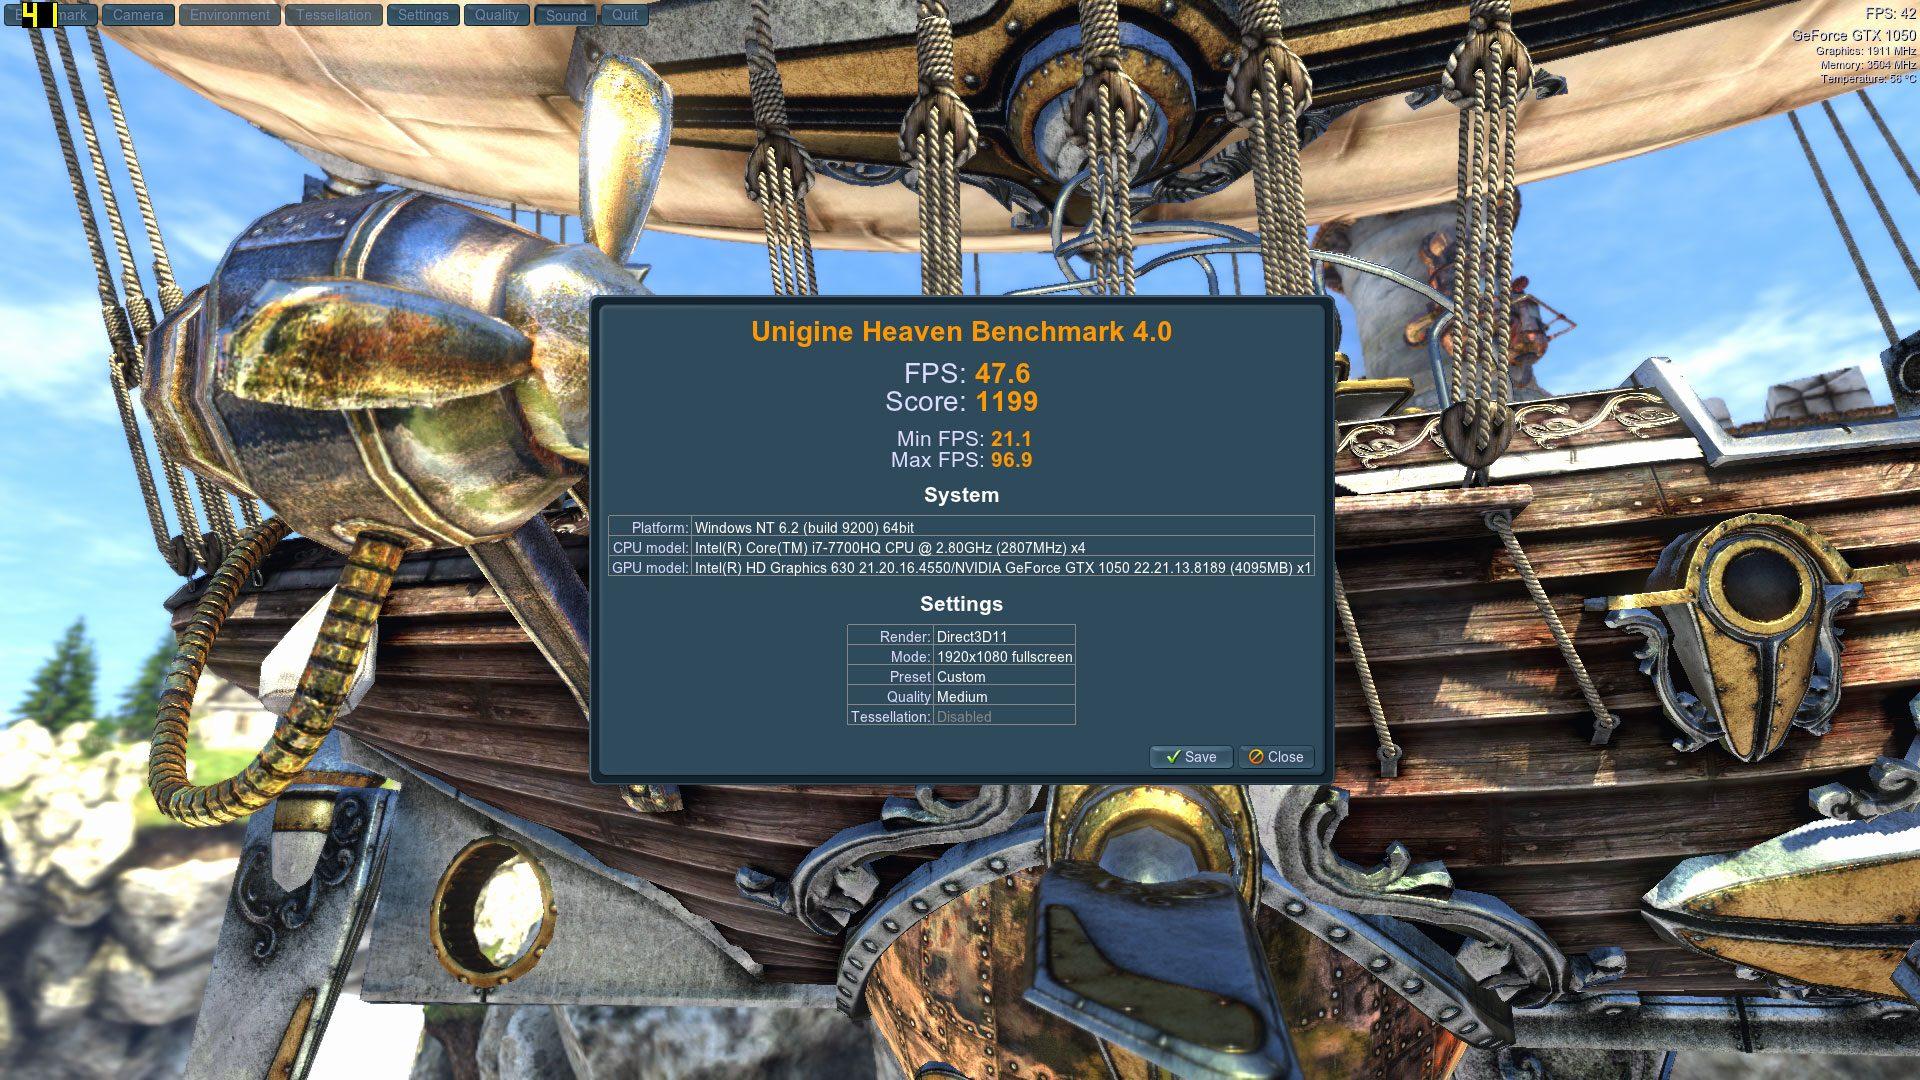 Asus Strix GL753VD-GC044T Grafik_11